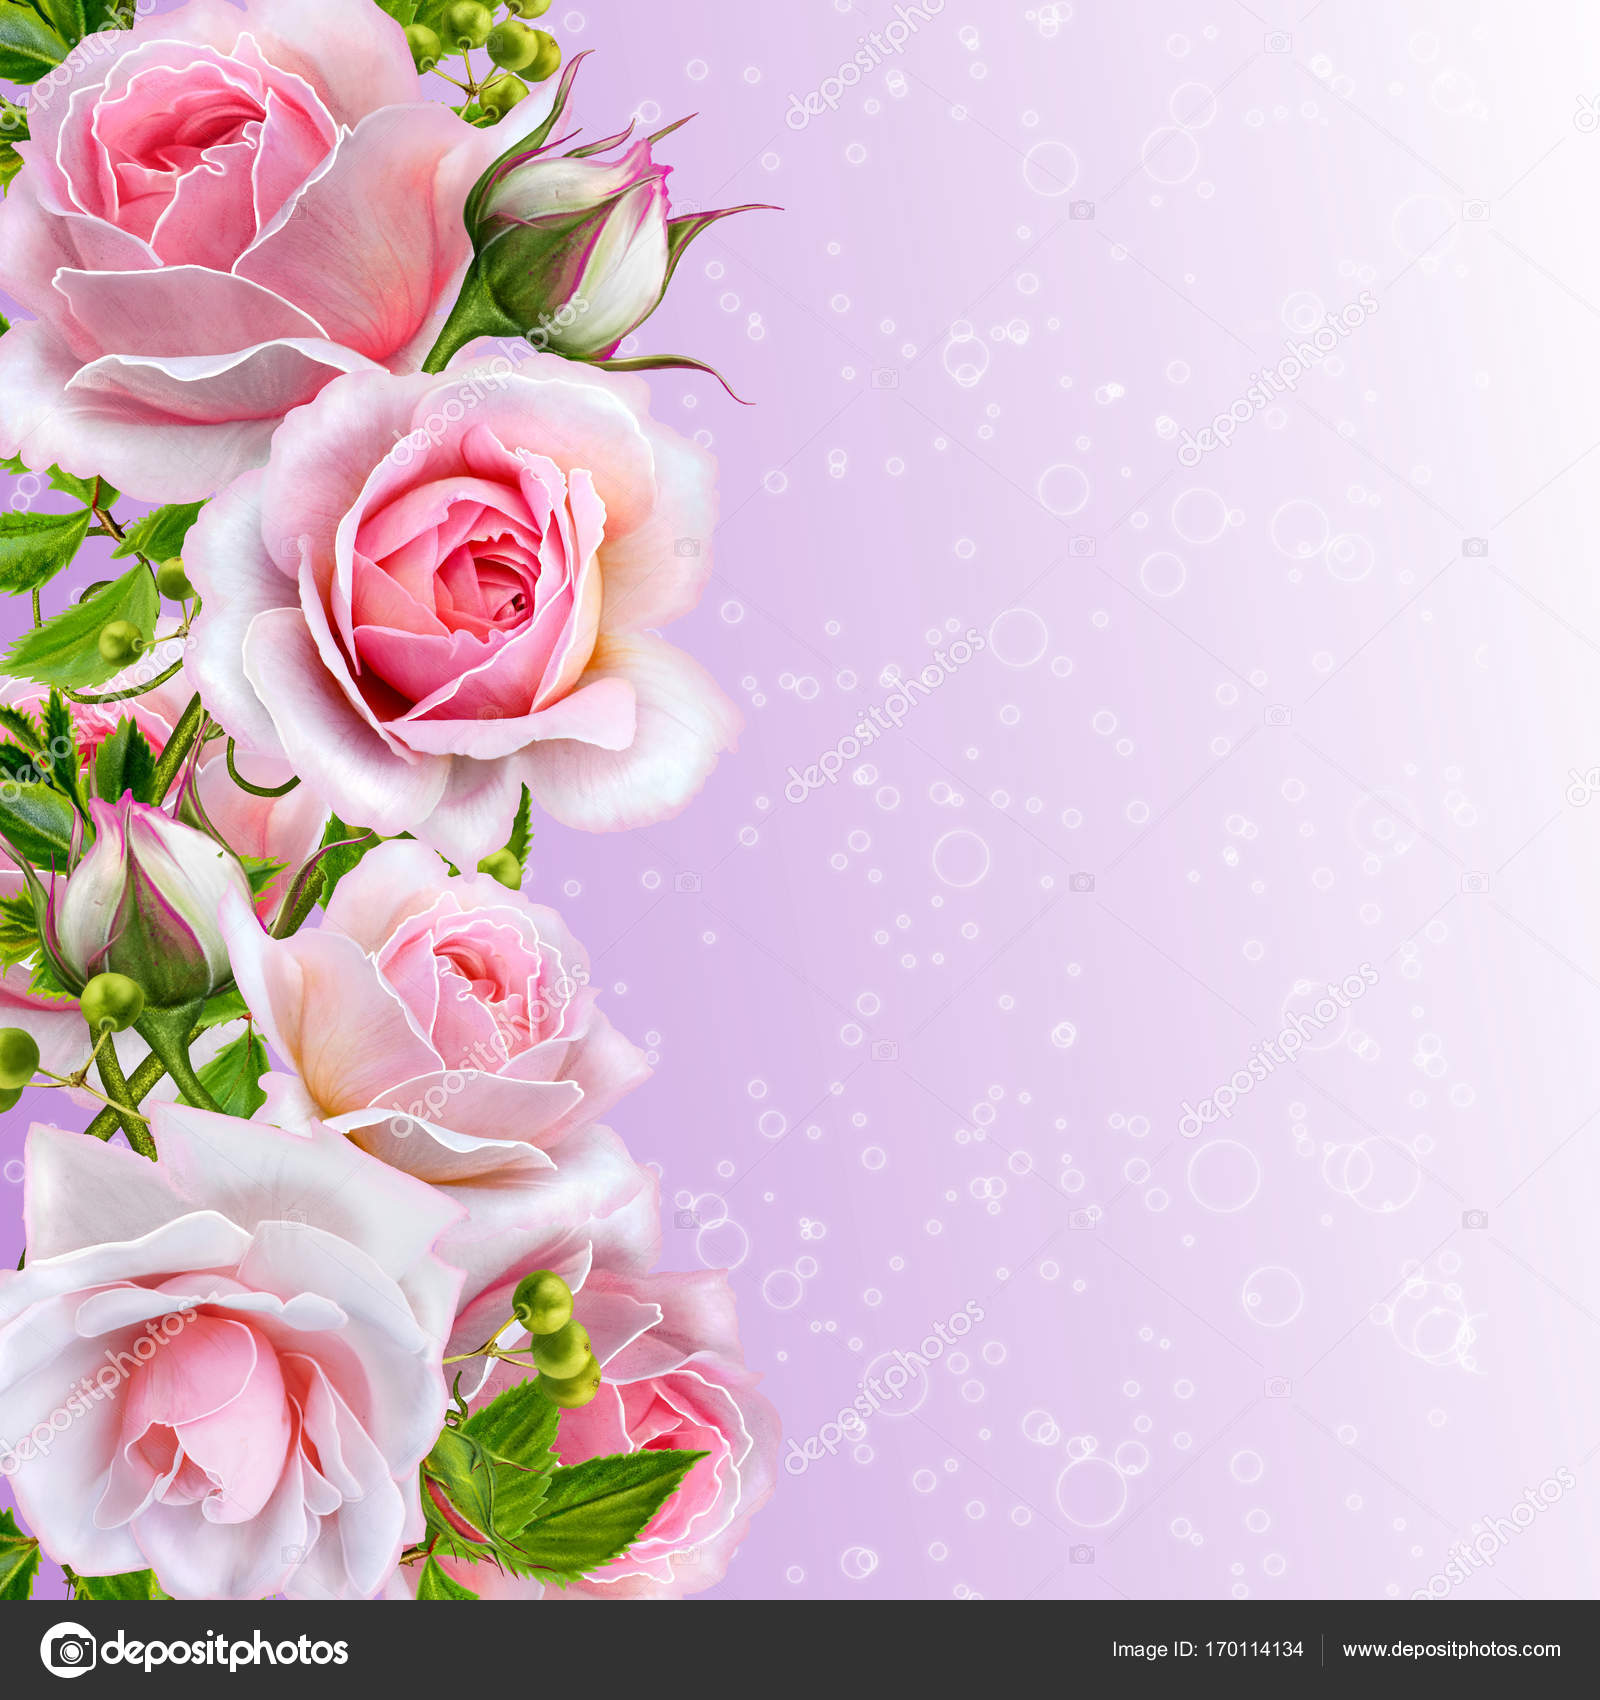 Floral Background Garland Of Flowers Tender Pink Roses Berries